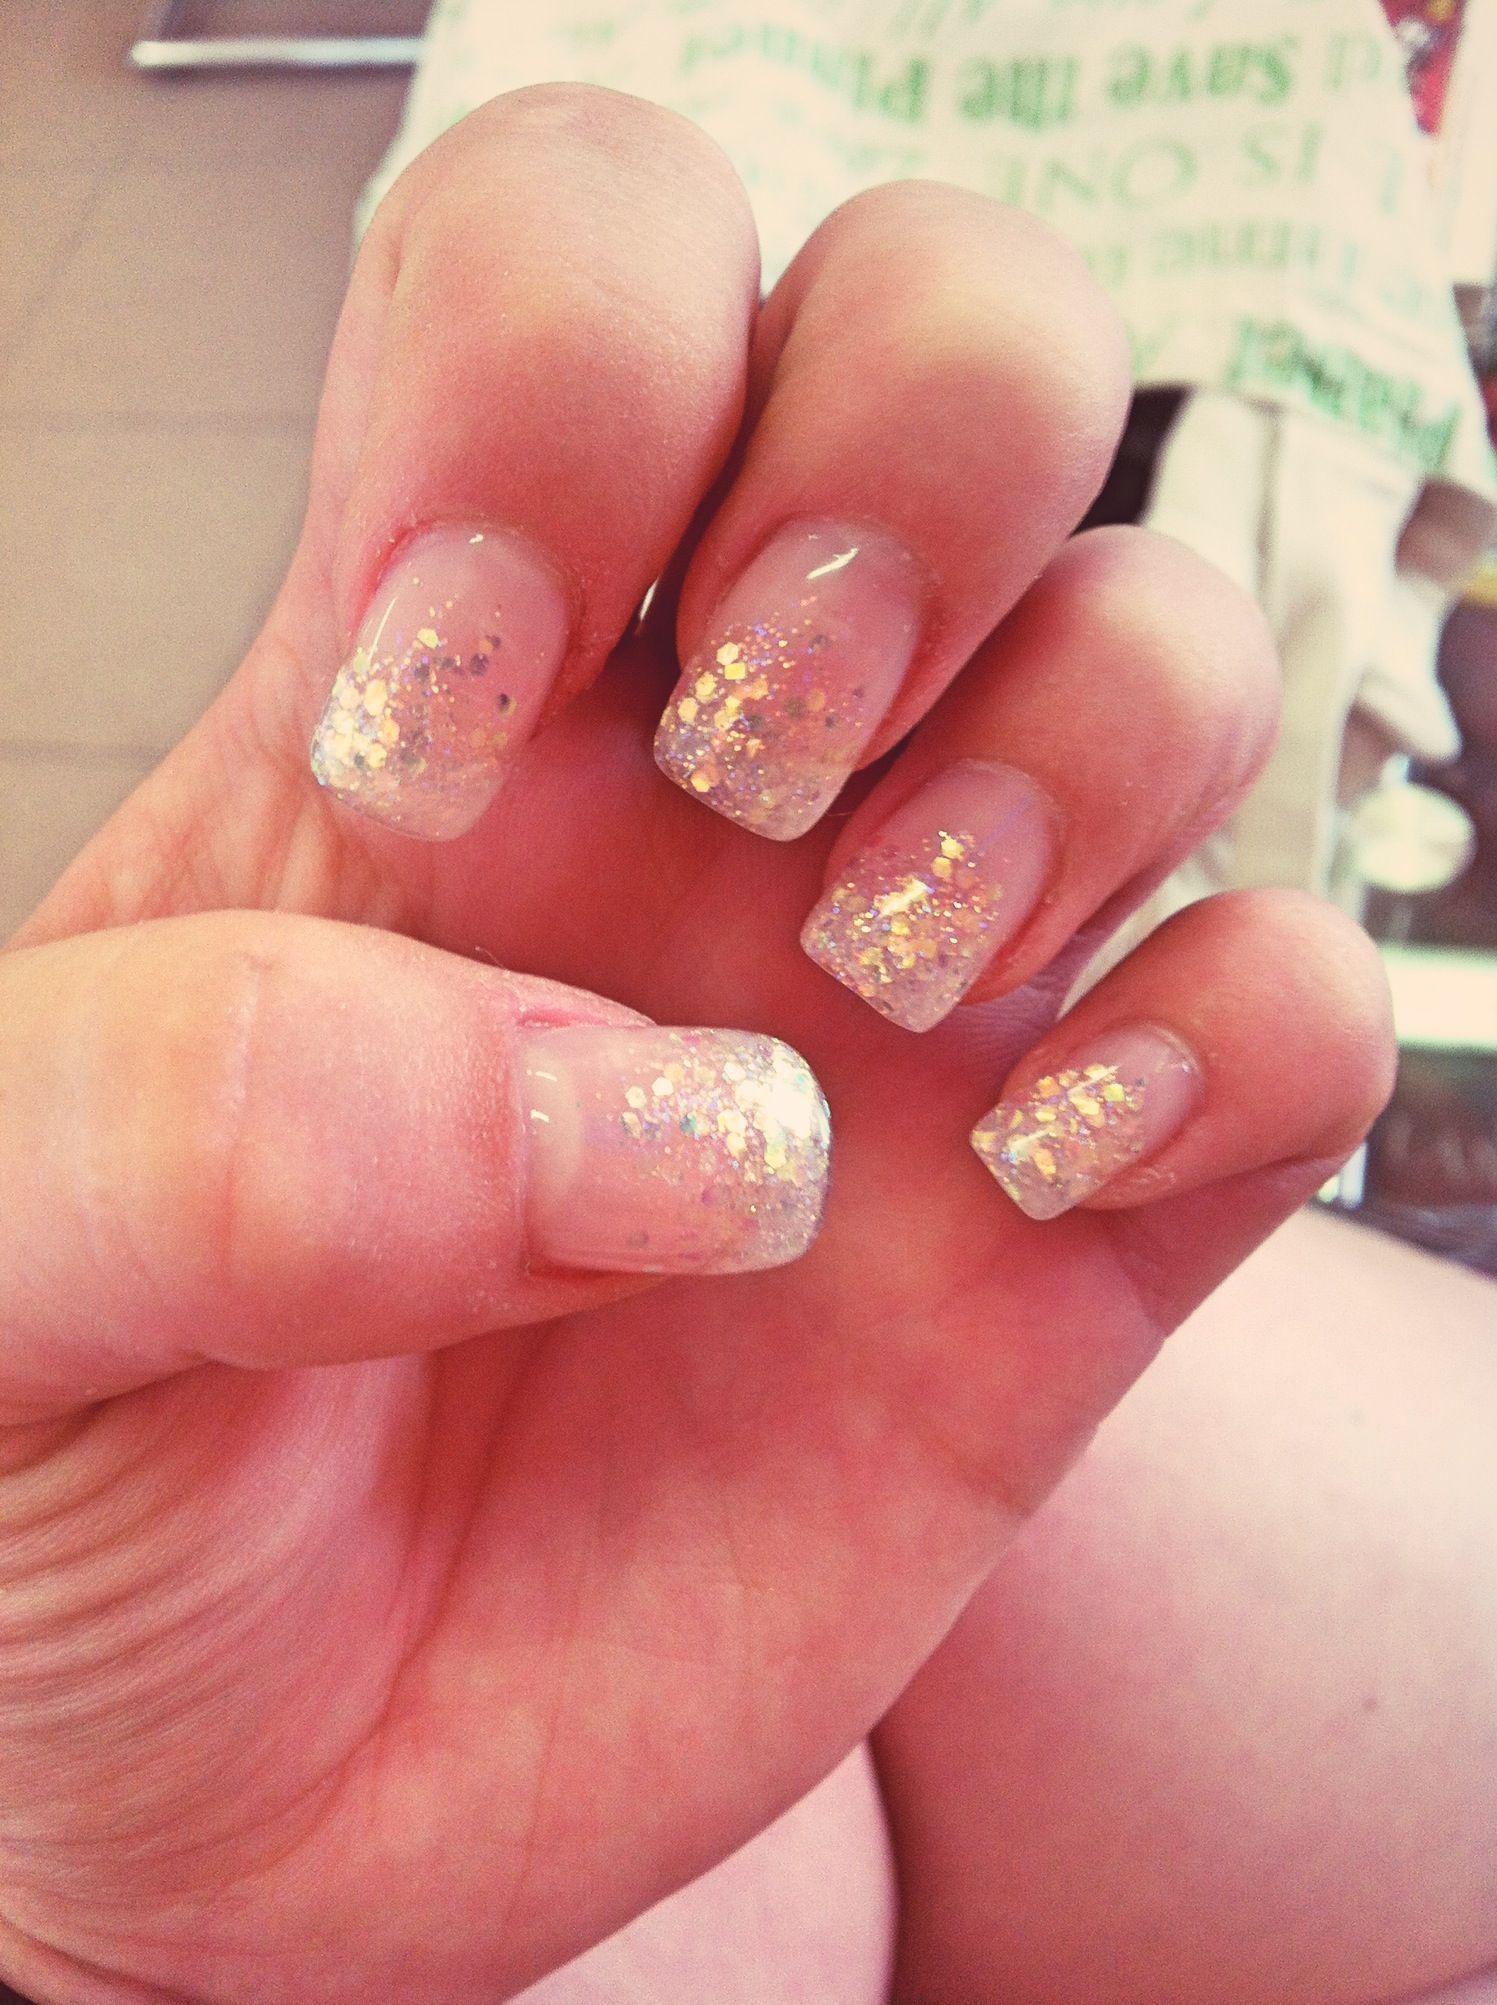 Beautiful glitter French gel nails   Makeup & Nails   Pinterest ...